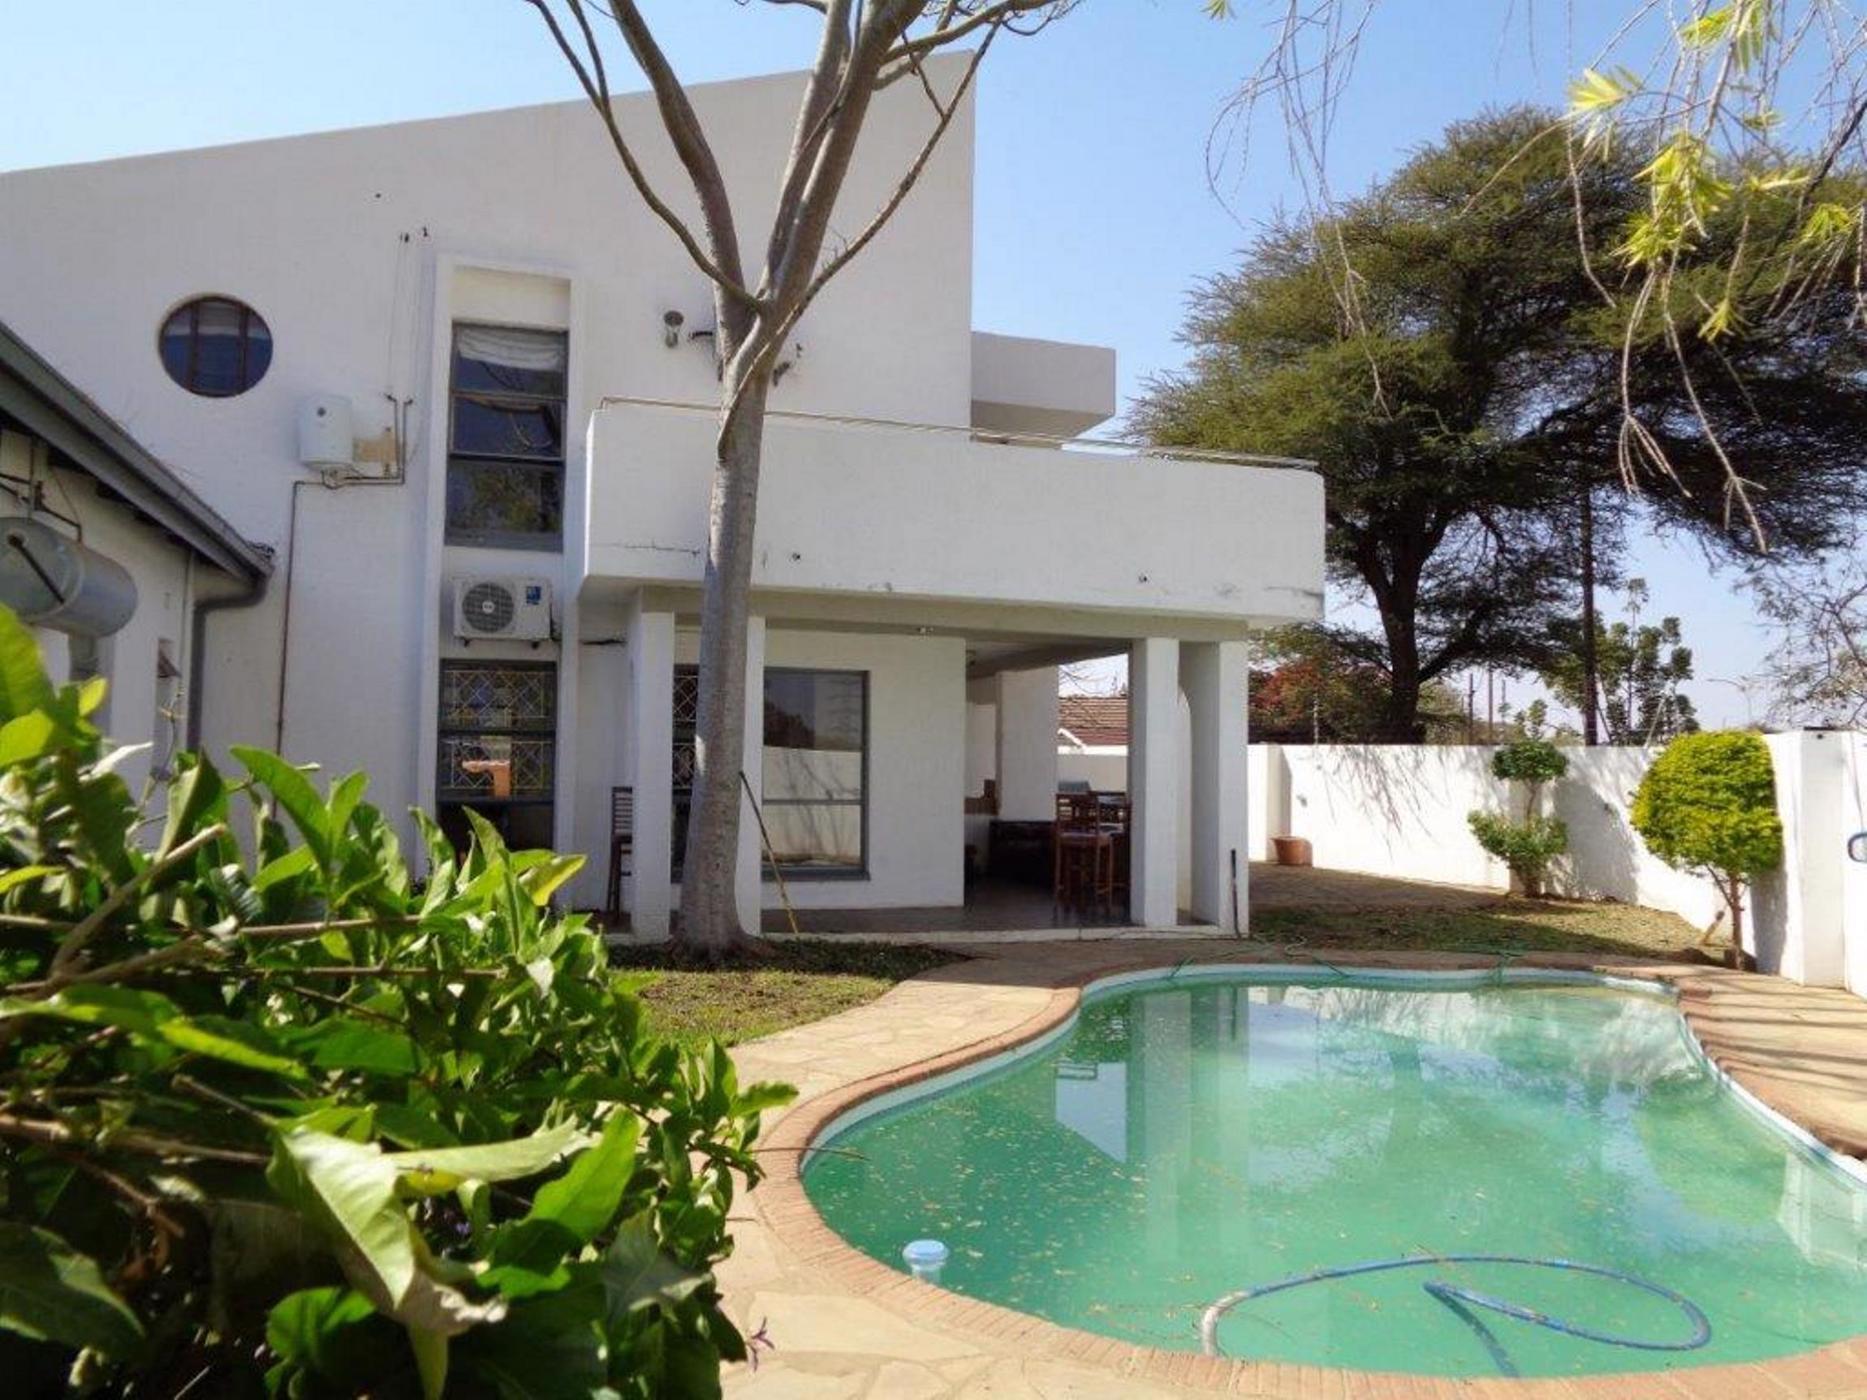 Property in Botswana | Farms for Sale in Botswana | Pam